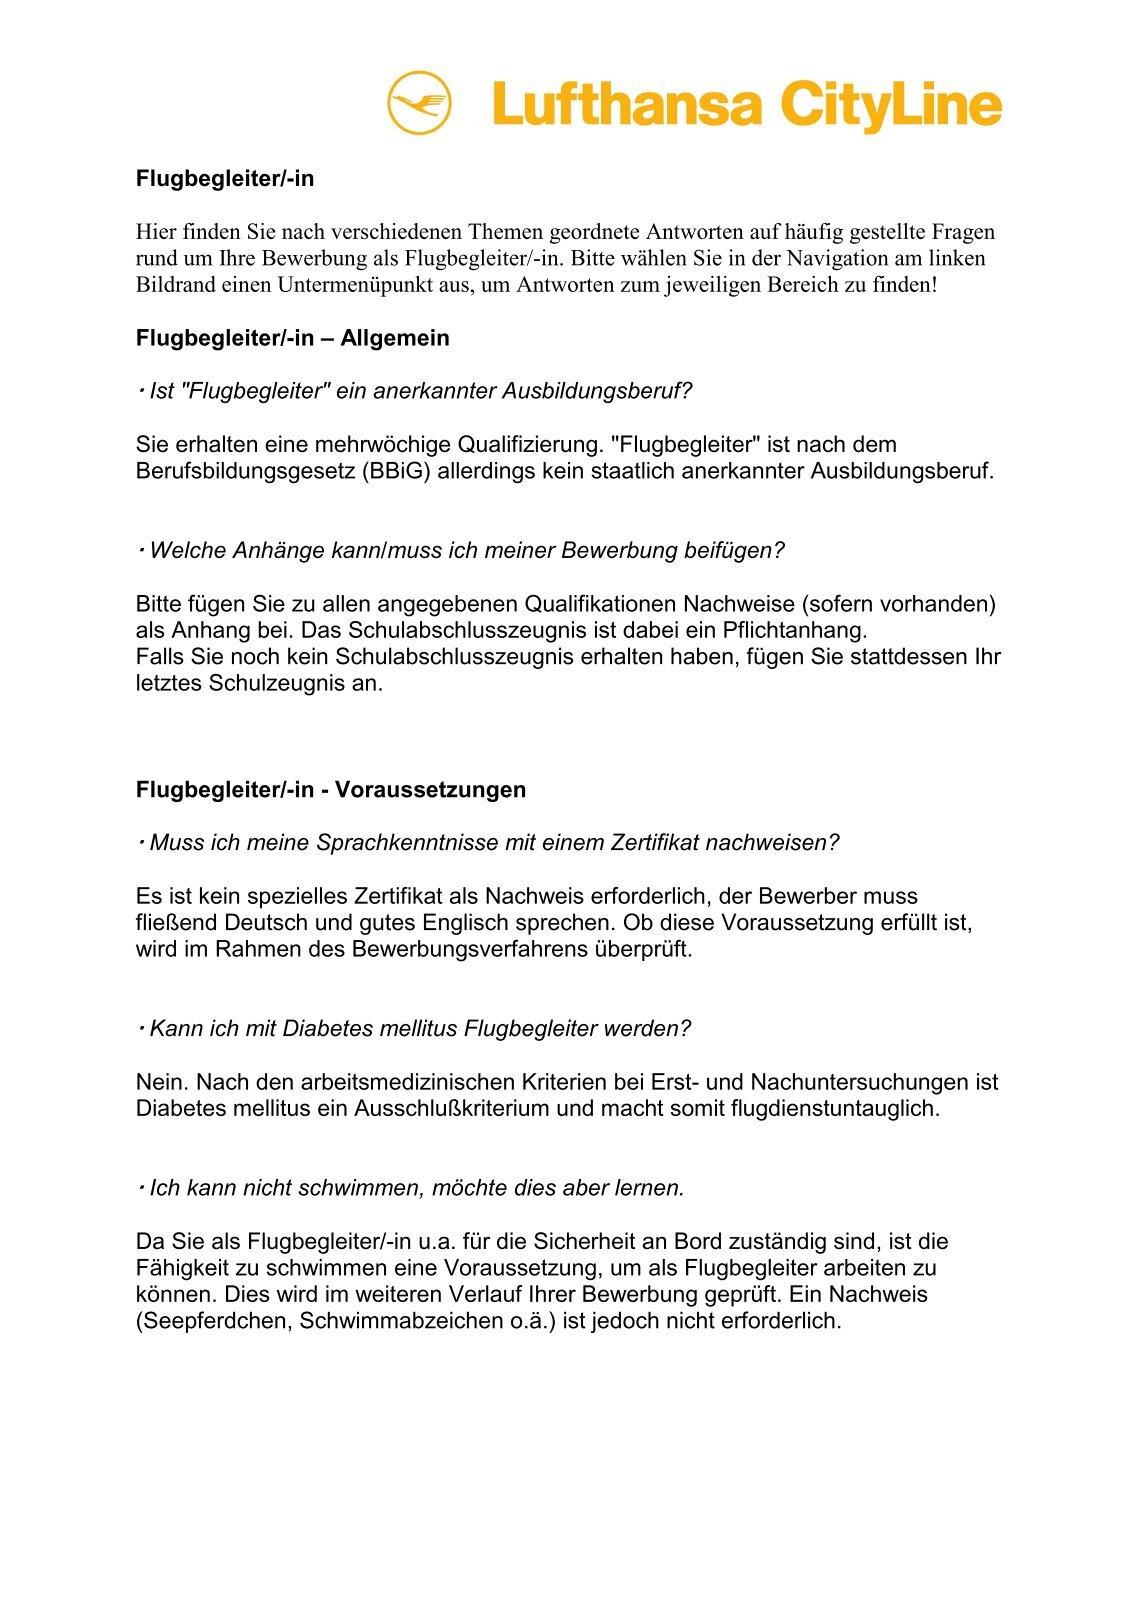 lufthansacityline - Be Lufthansacom Bewerbung